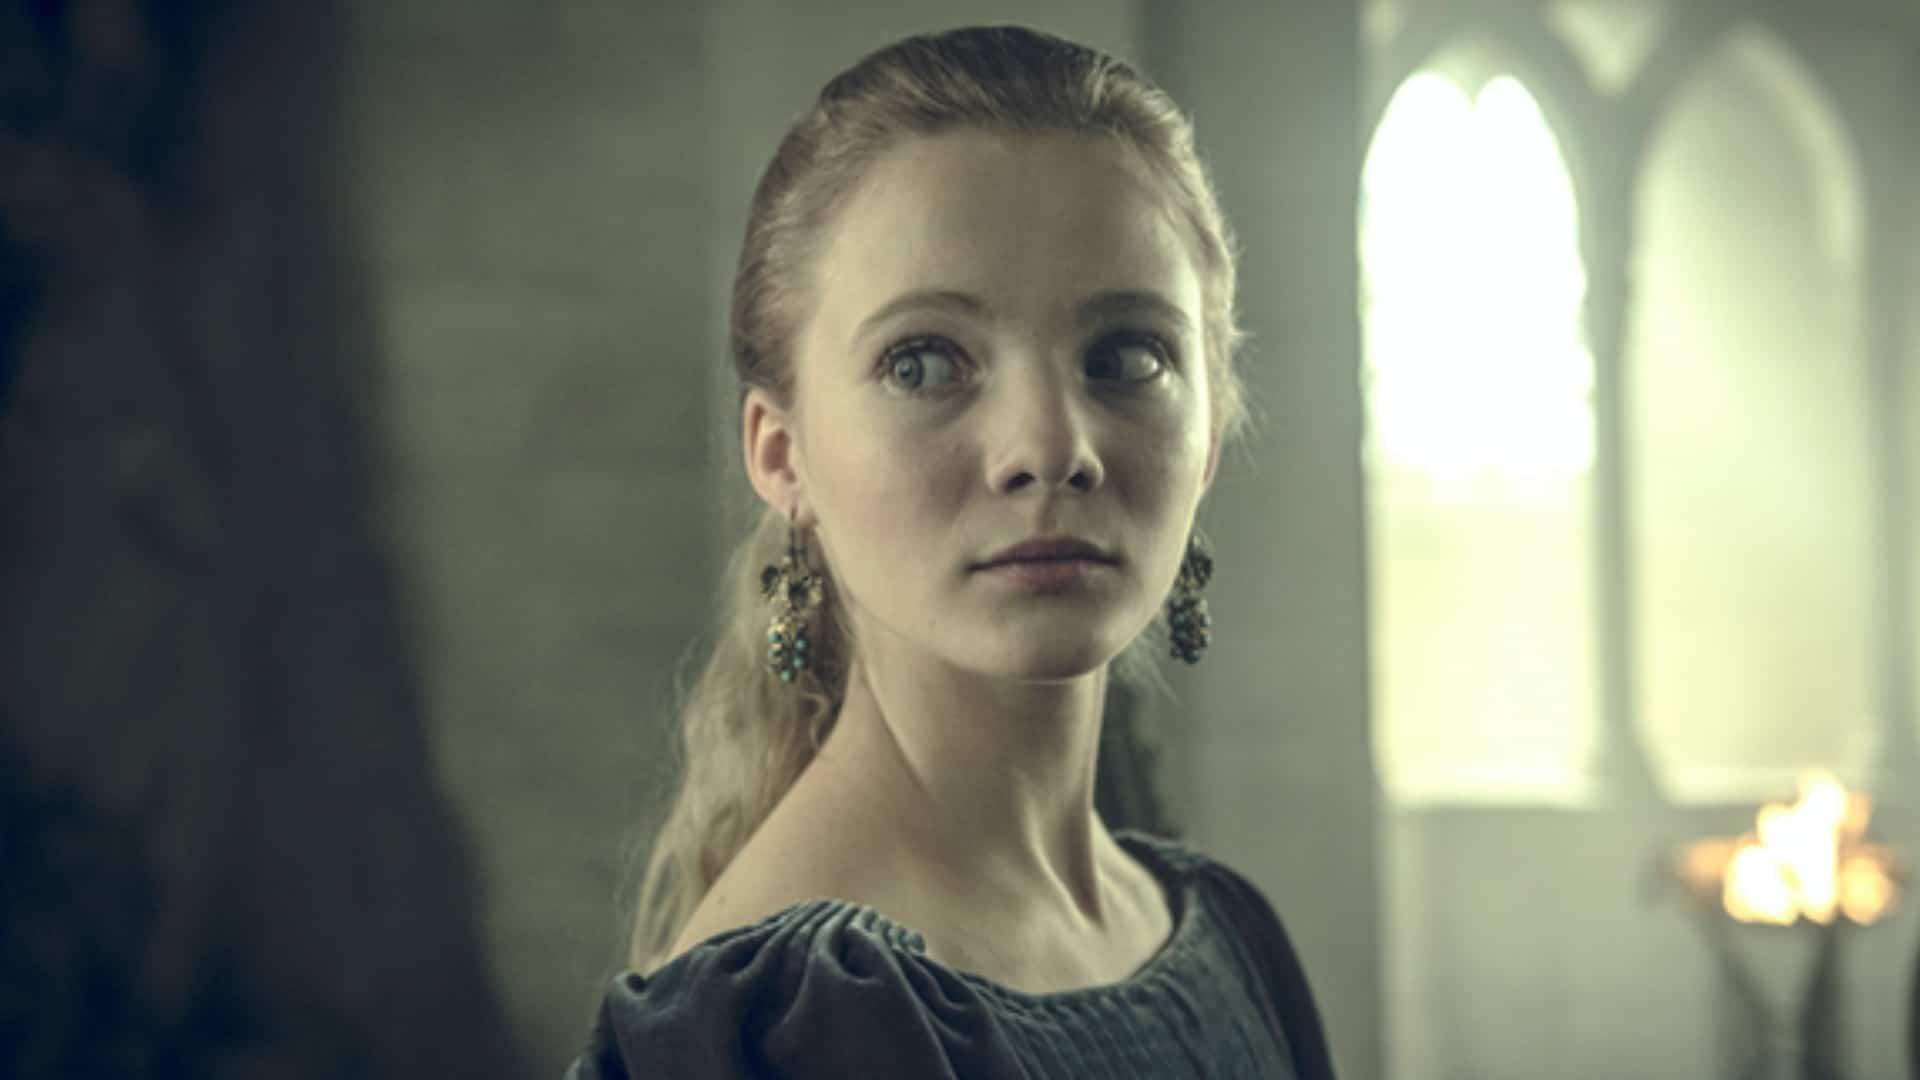 Ciri (Freya Allan) em The Witcher (Reprodução)